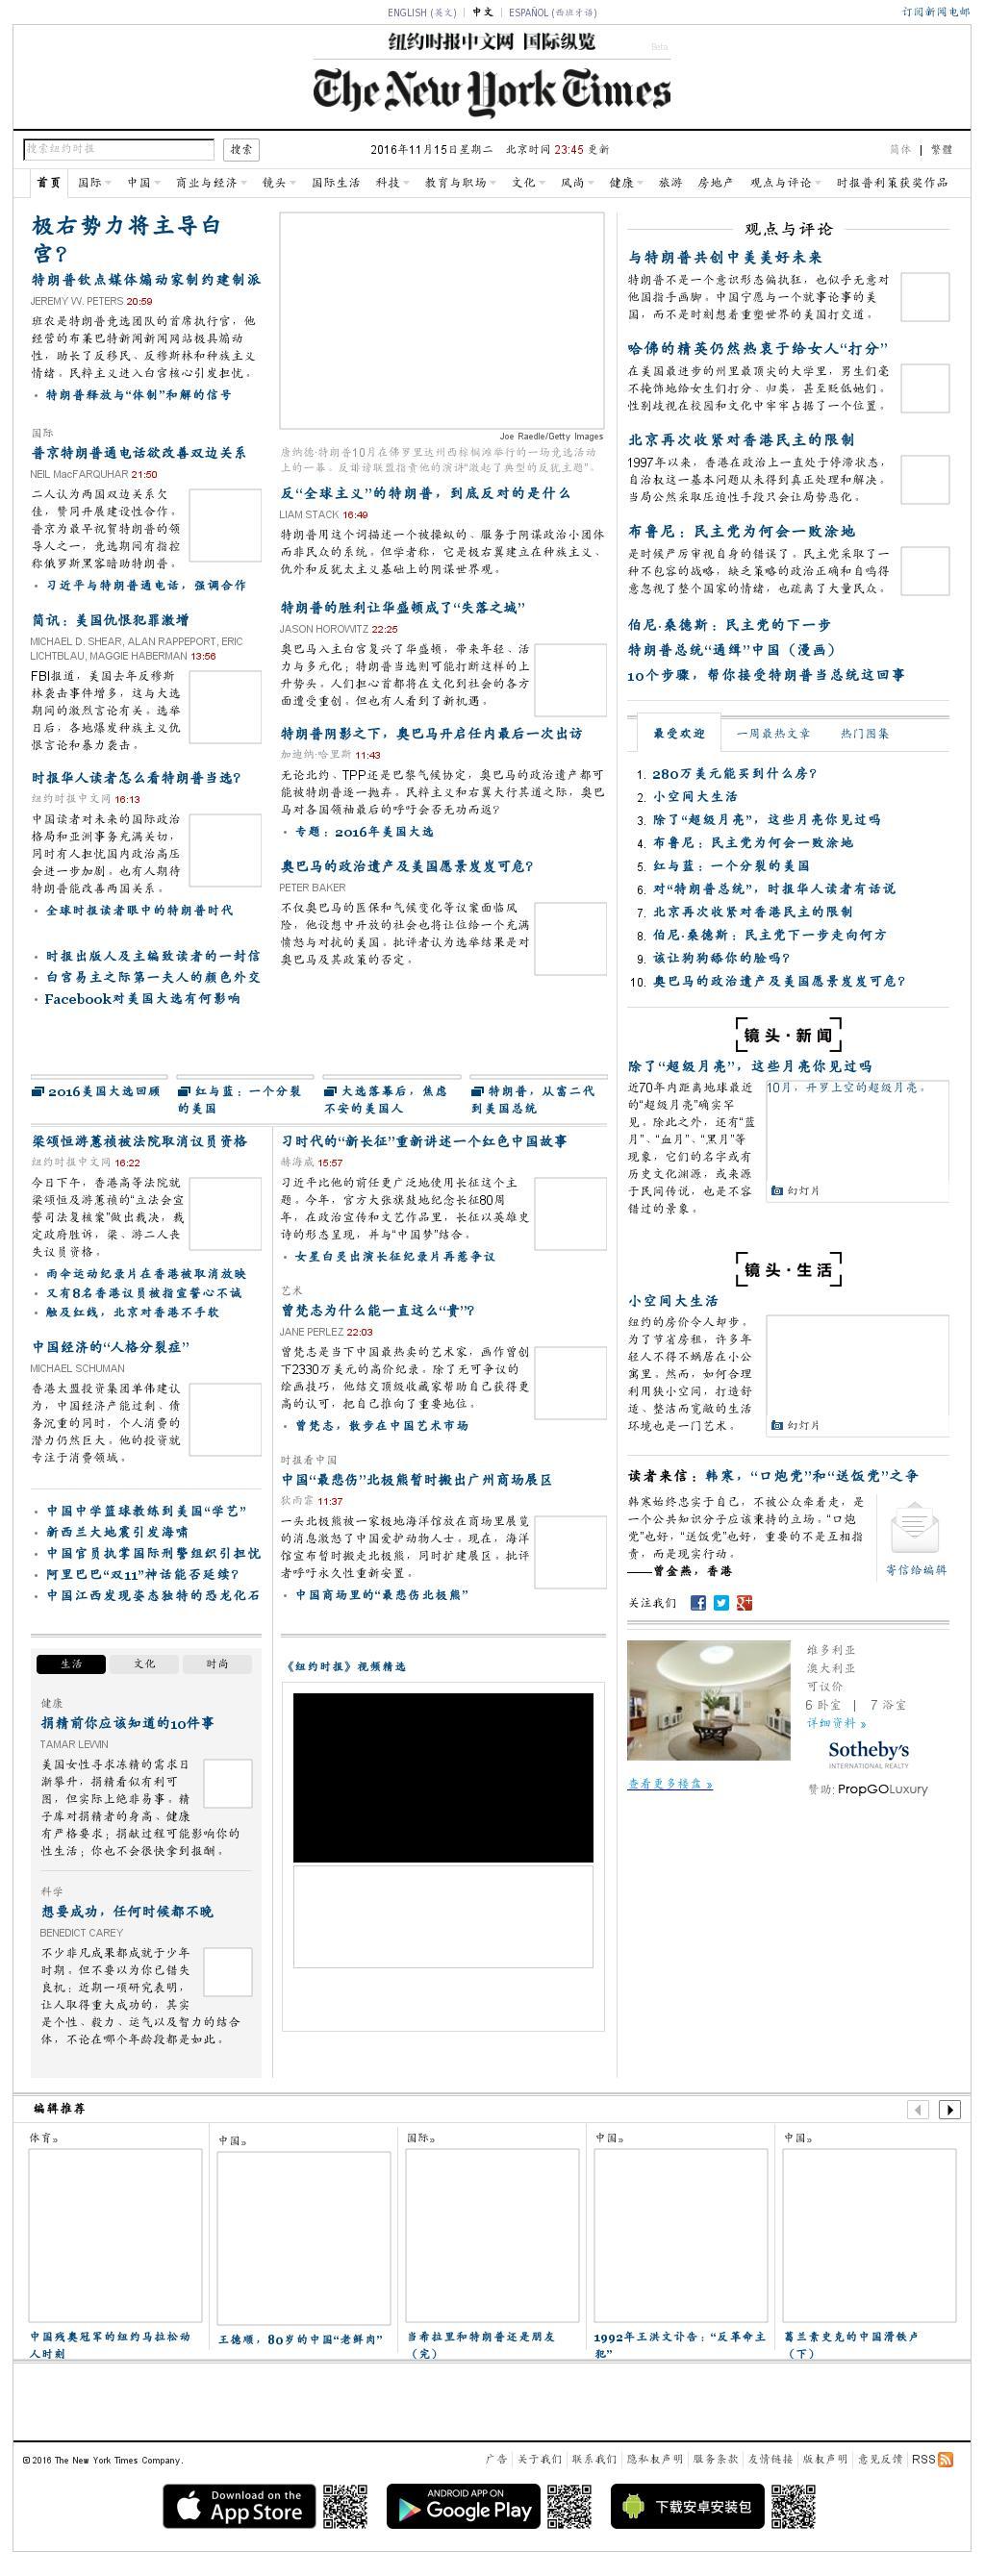 The New York Times (Chinese) at Tuesday Nov. 15, 2016, 5:11 p.m. UTC